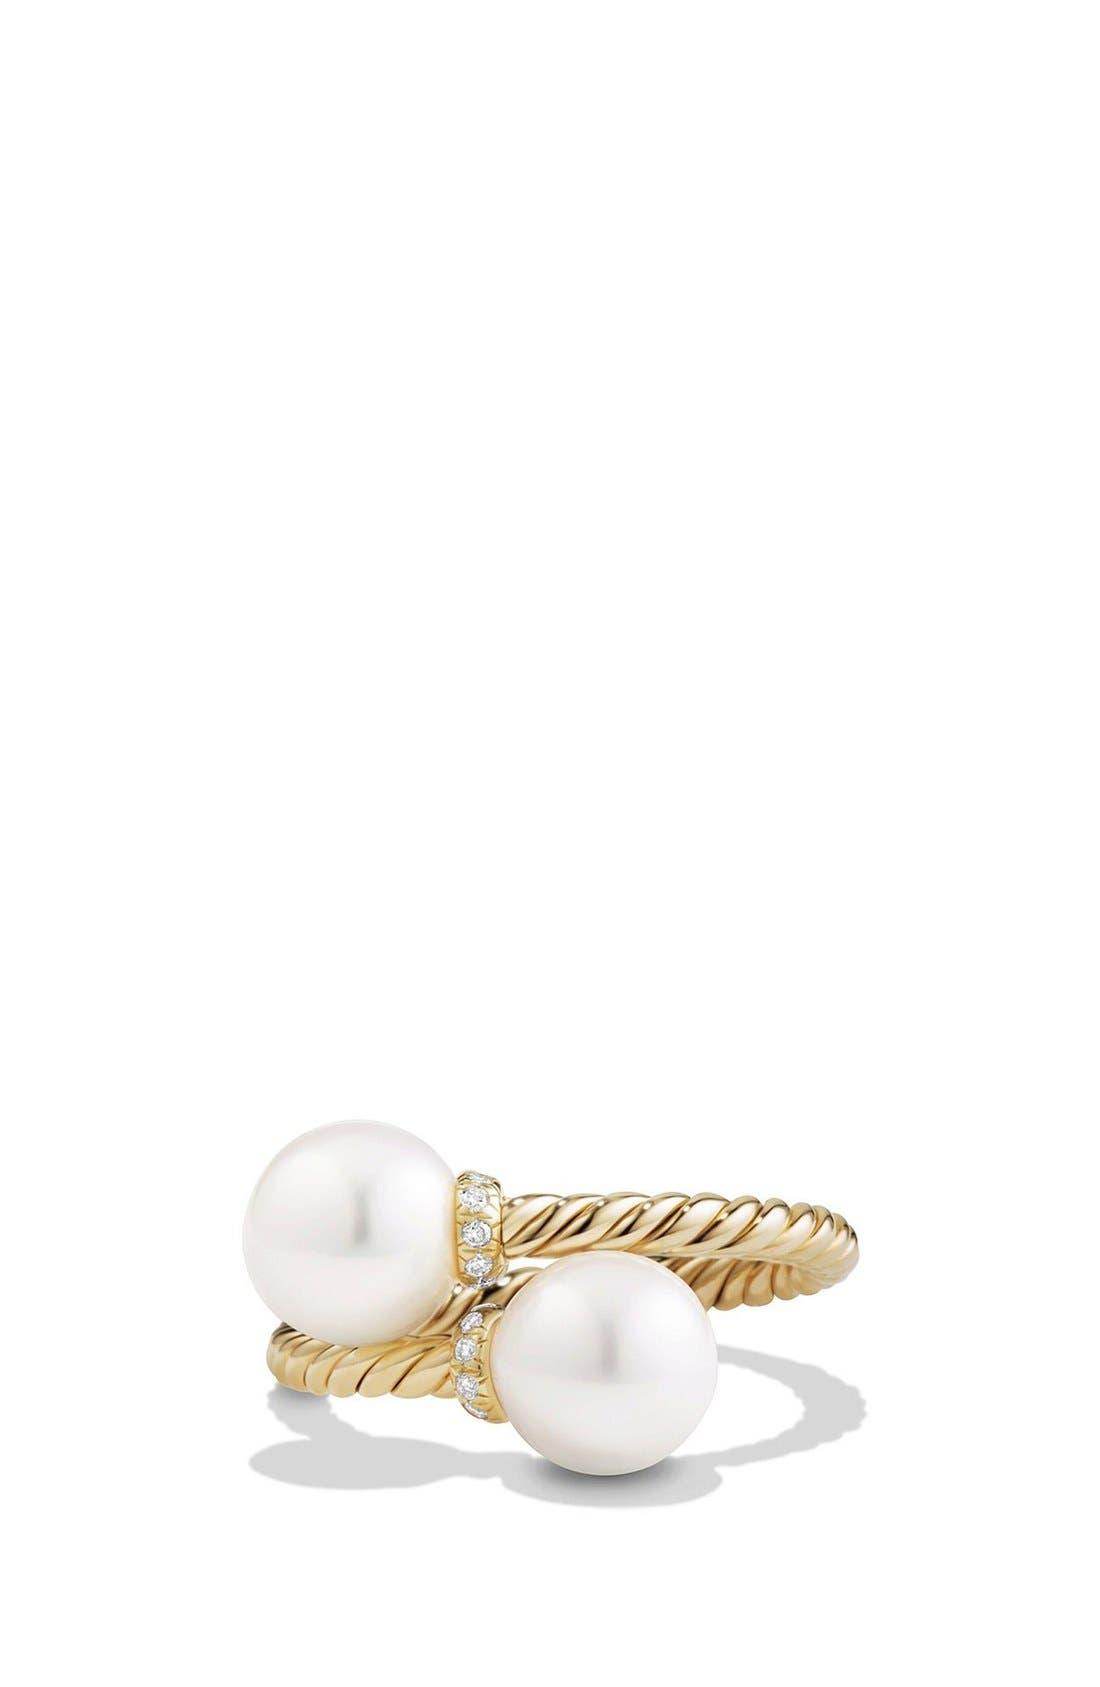 david yurman bead ring with diamonds and pearls in 18k gold